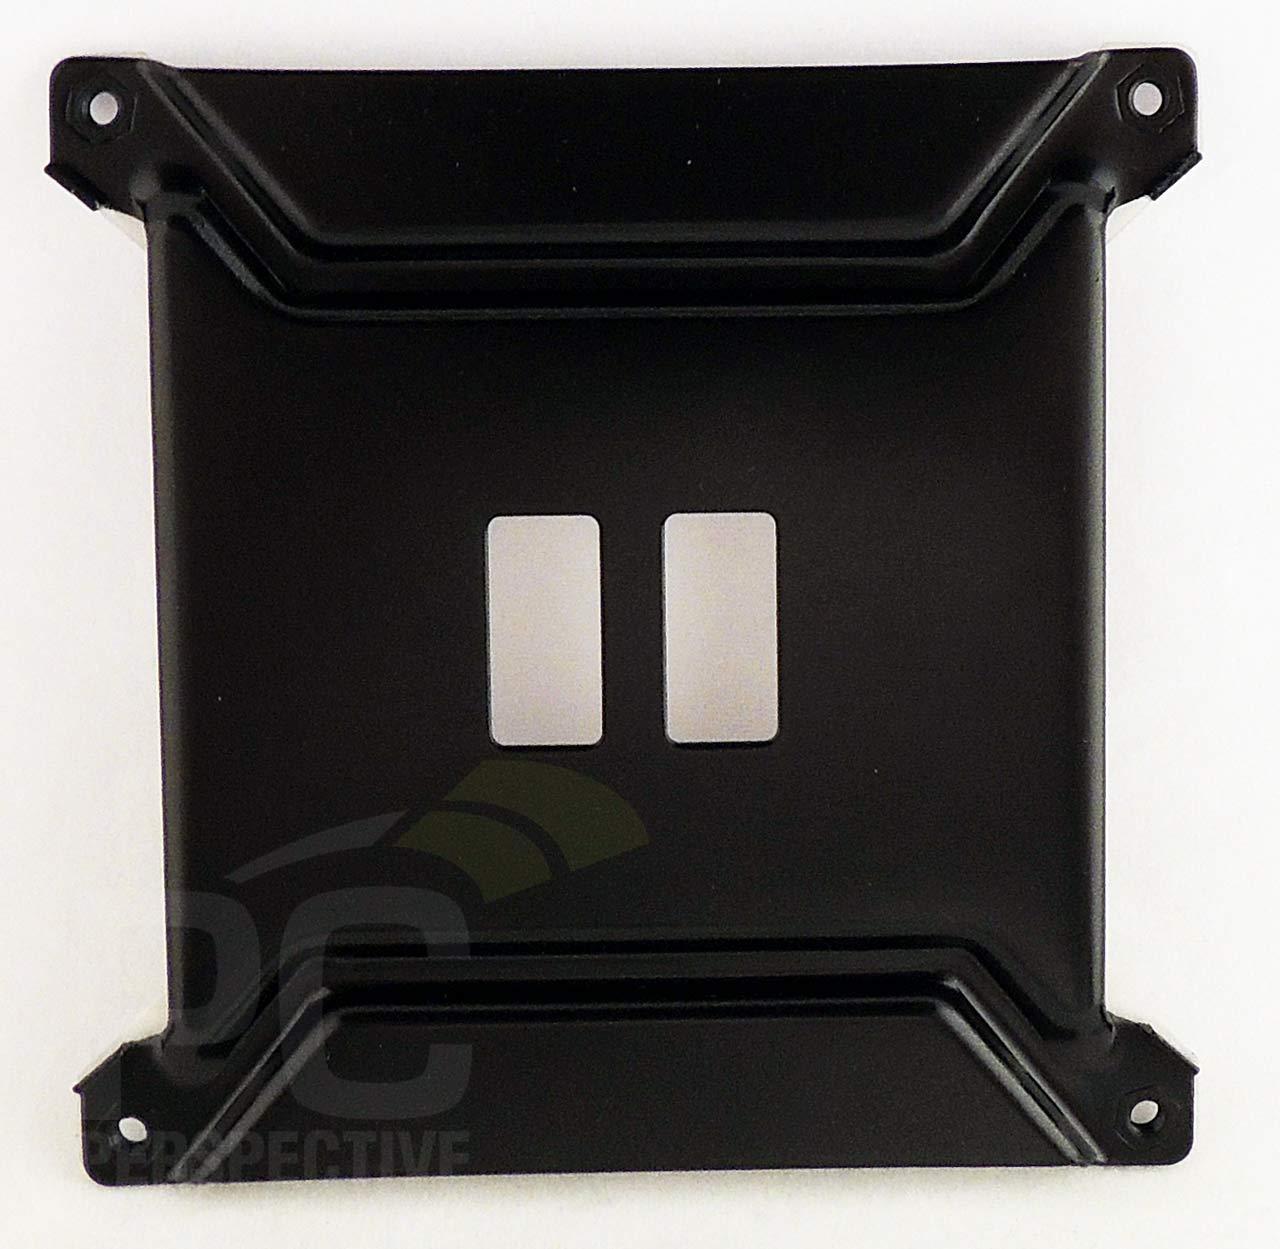 09-intel-1366-2011-backplate-bottom.jpg